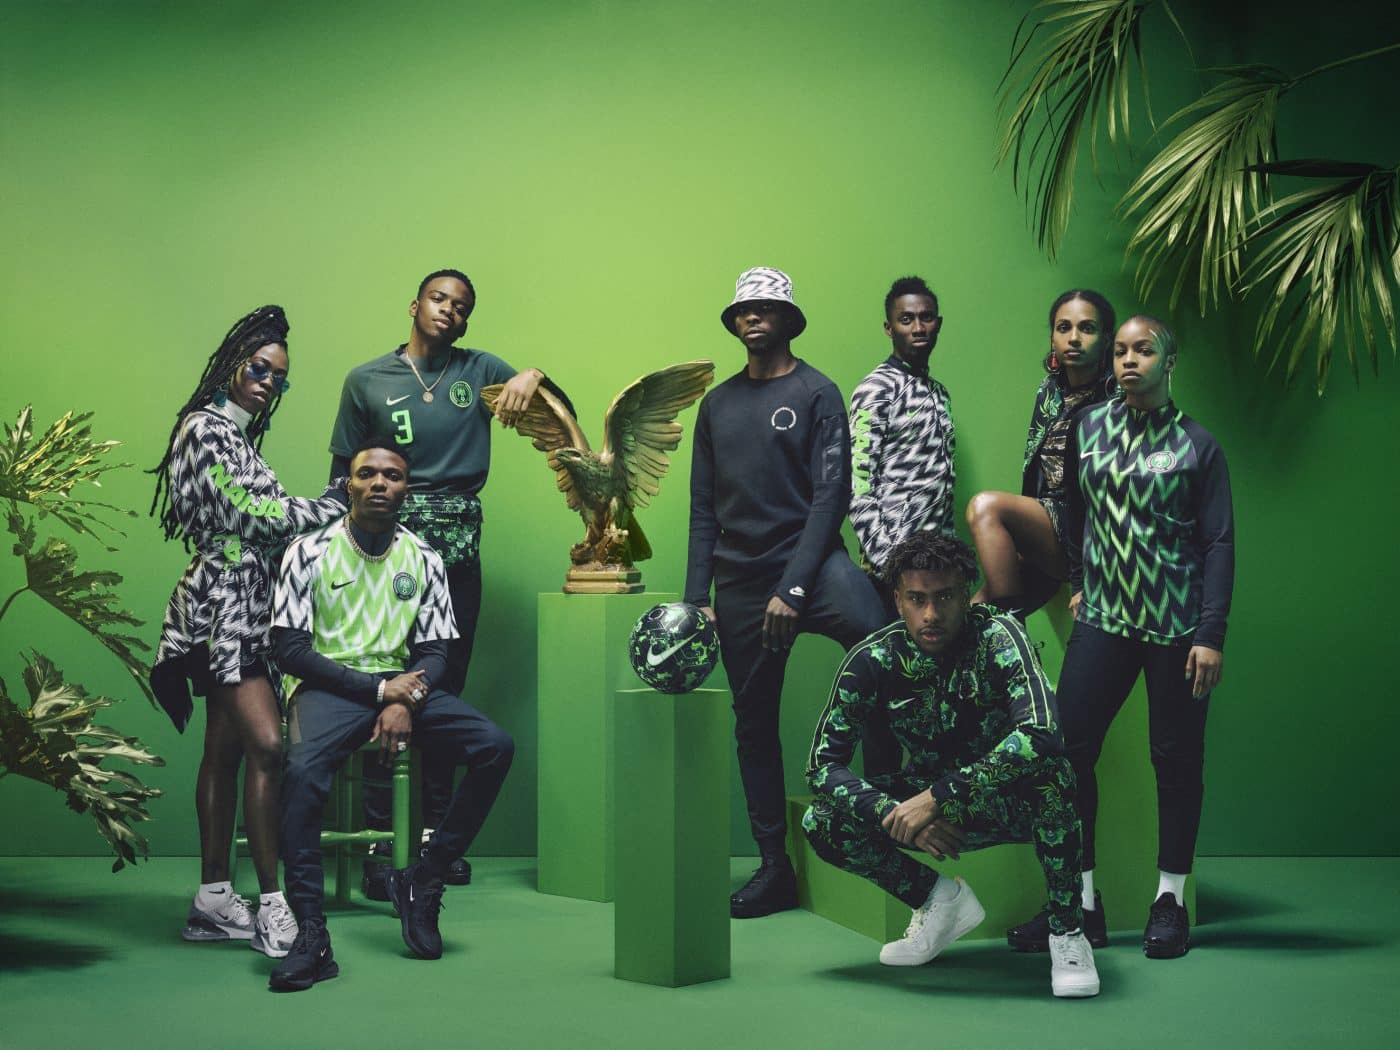 contrat-nigeria-nike-football-3